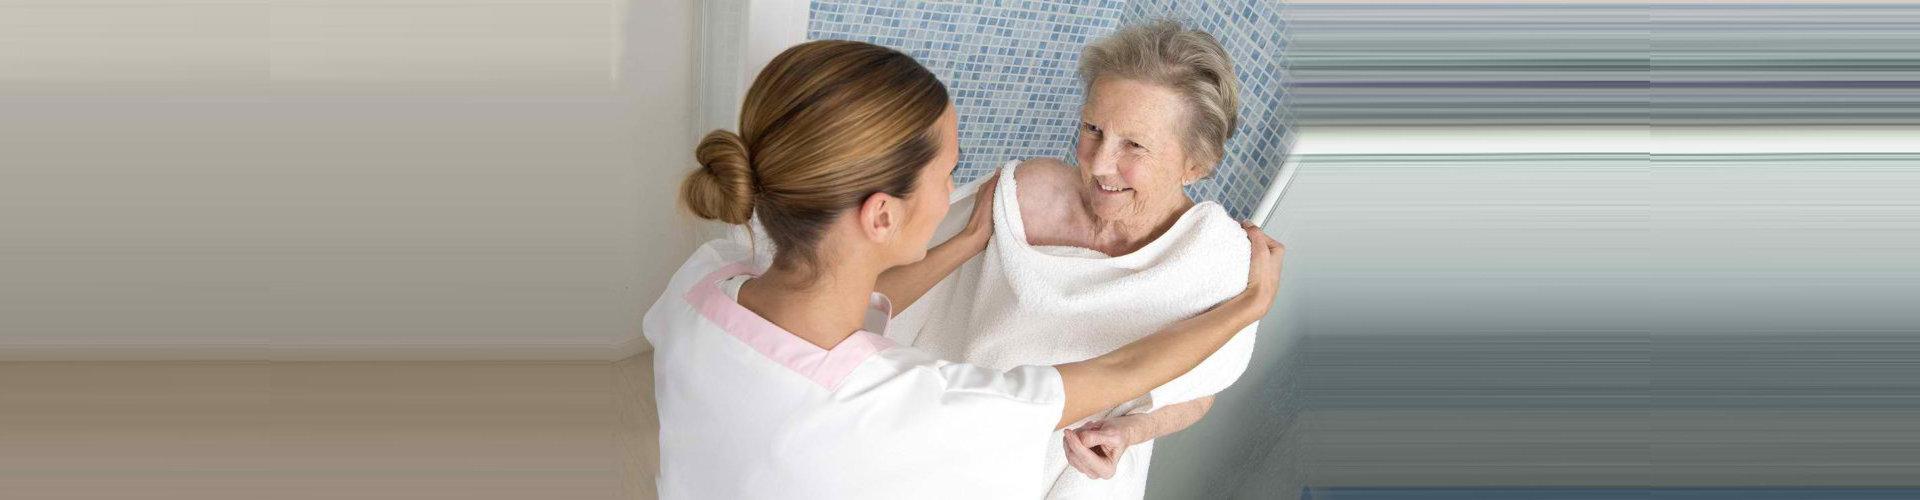 """caregiver assisting a senior woman bathing"